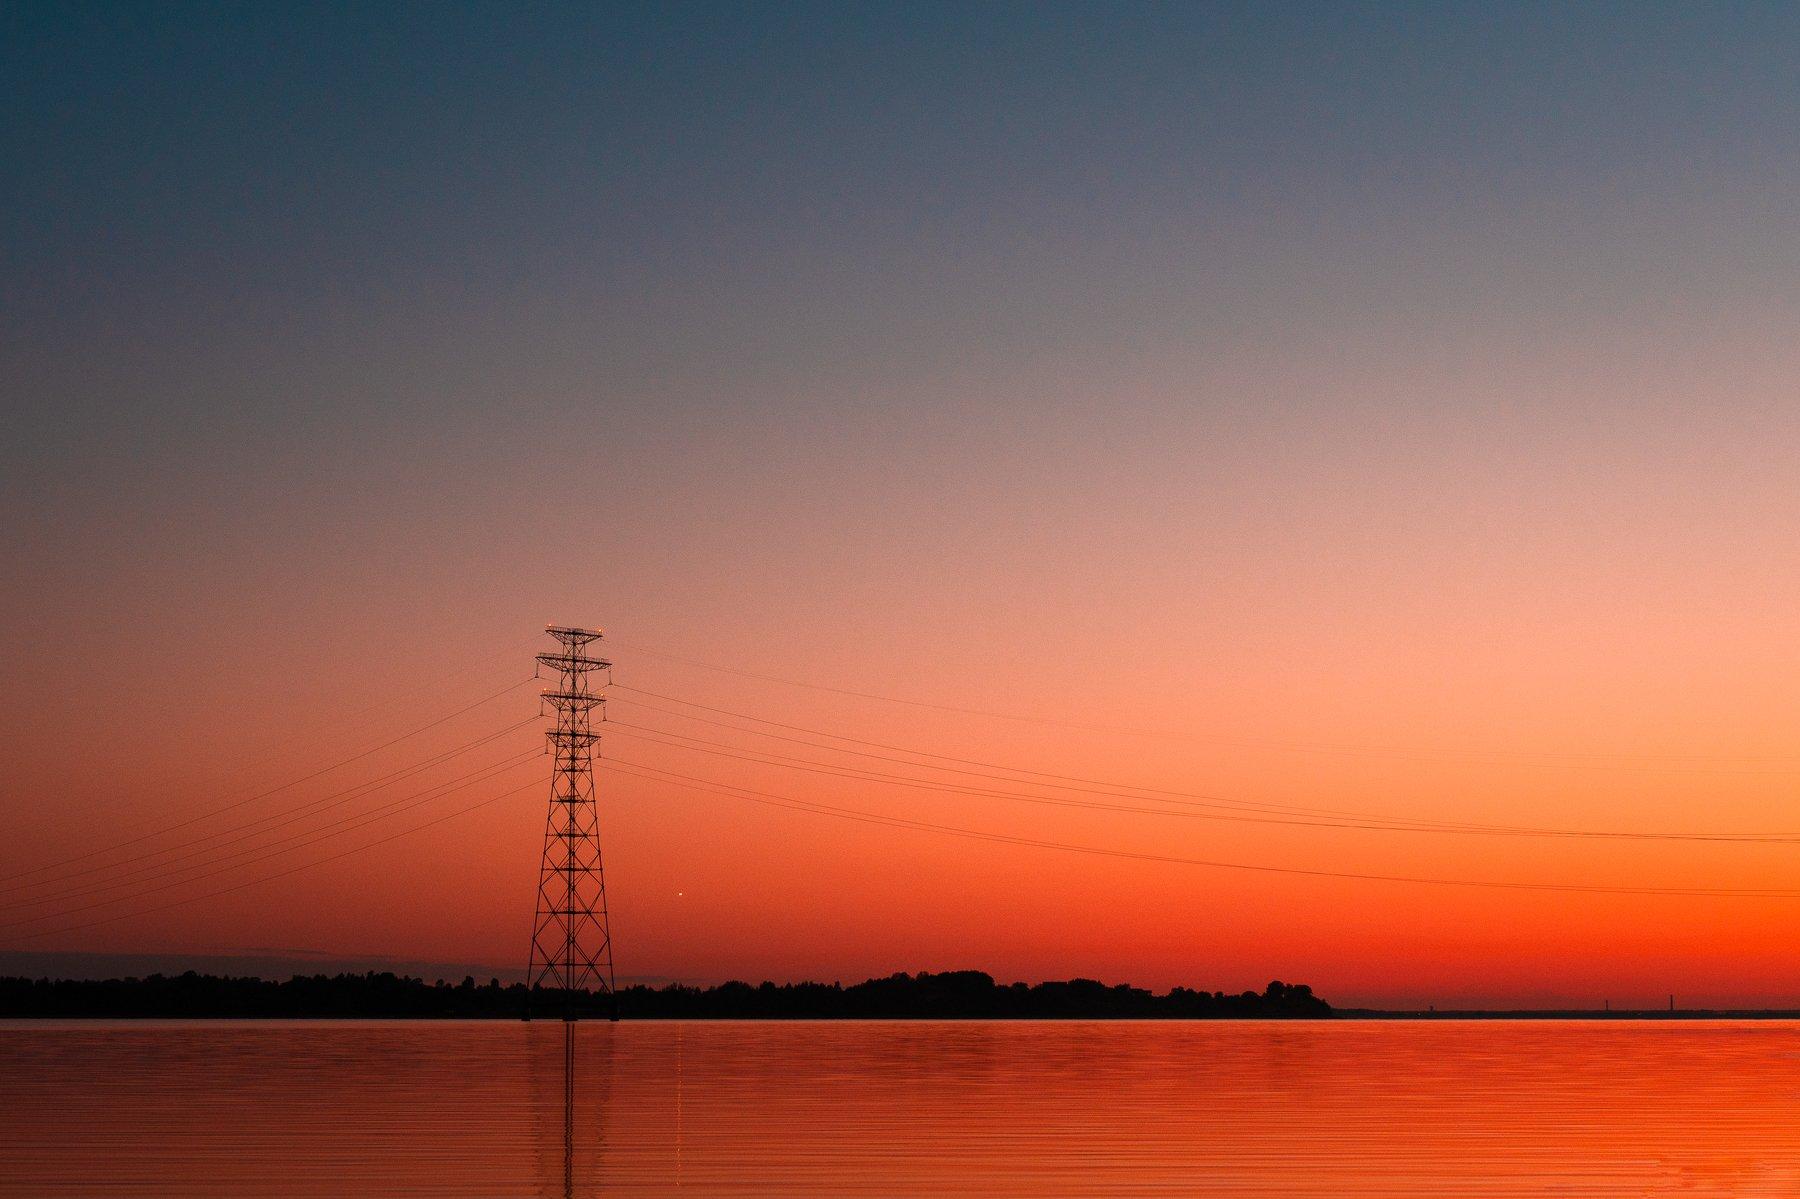 пейзаж,закат, лето,вода,минимализм , Дмитрий Рябцев